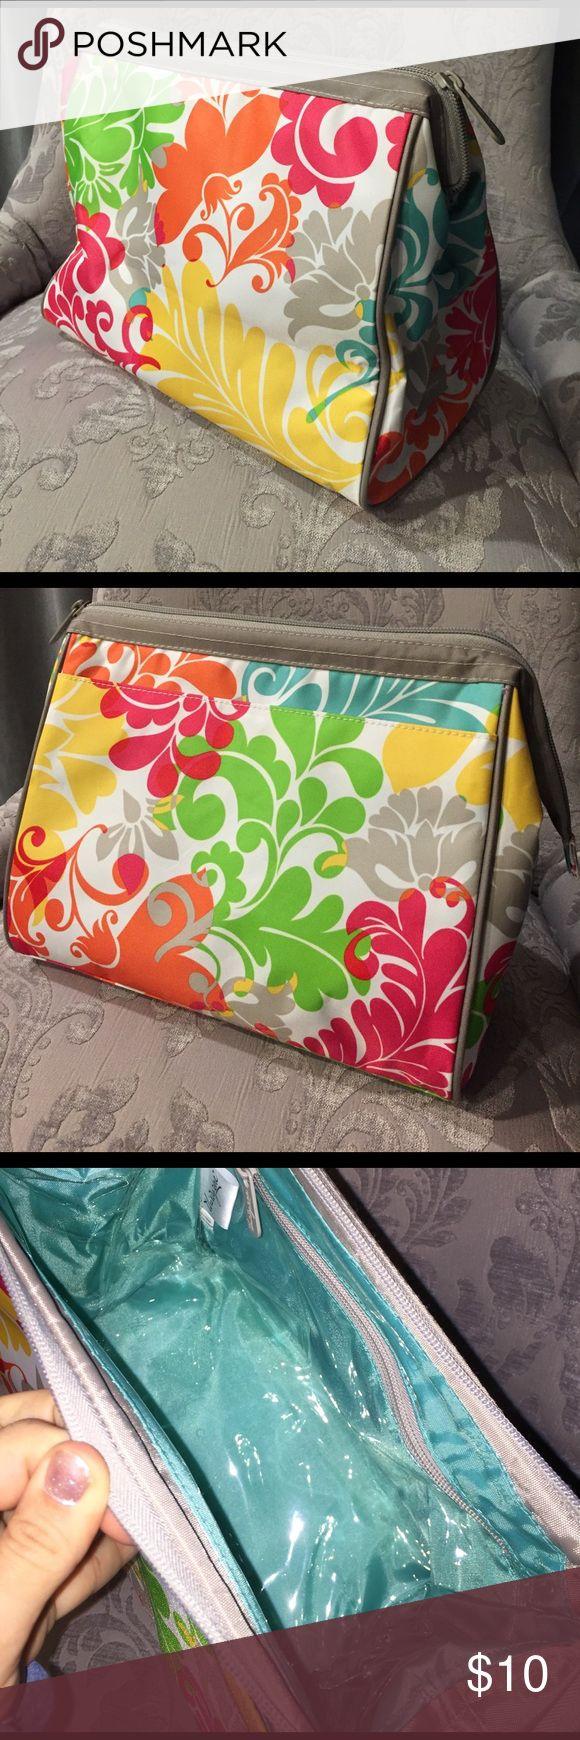 Selling this Thirty One Make Up Bag on Poshmark! My username is: alisonsue1. #shopmycloset #poshmark #fashion #shopping #style #forsale #Thirty One #Handbags